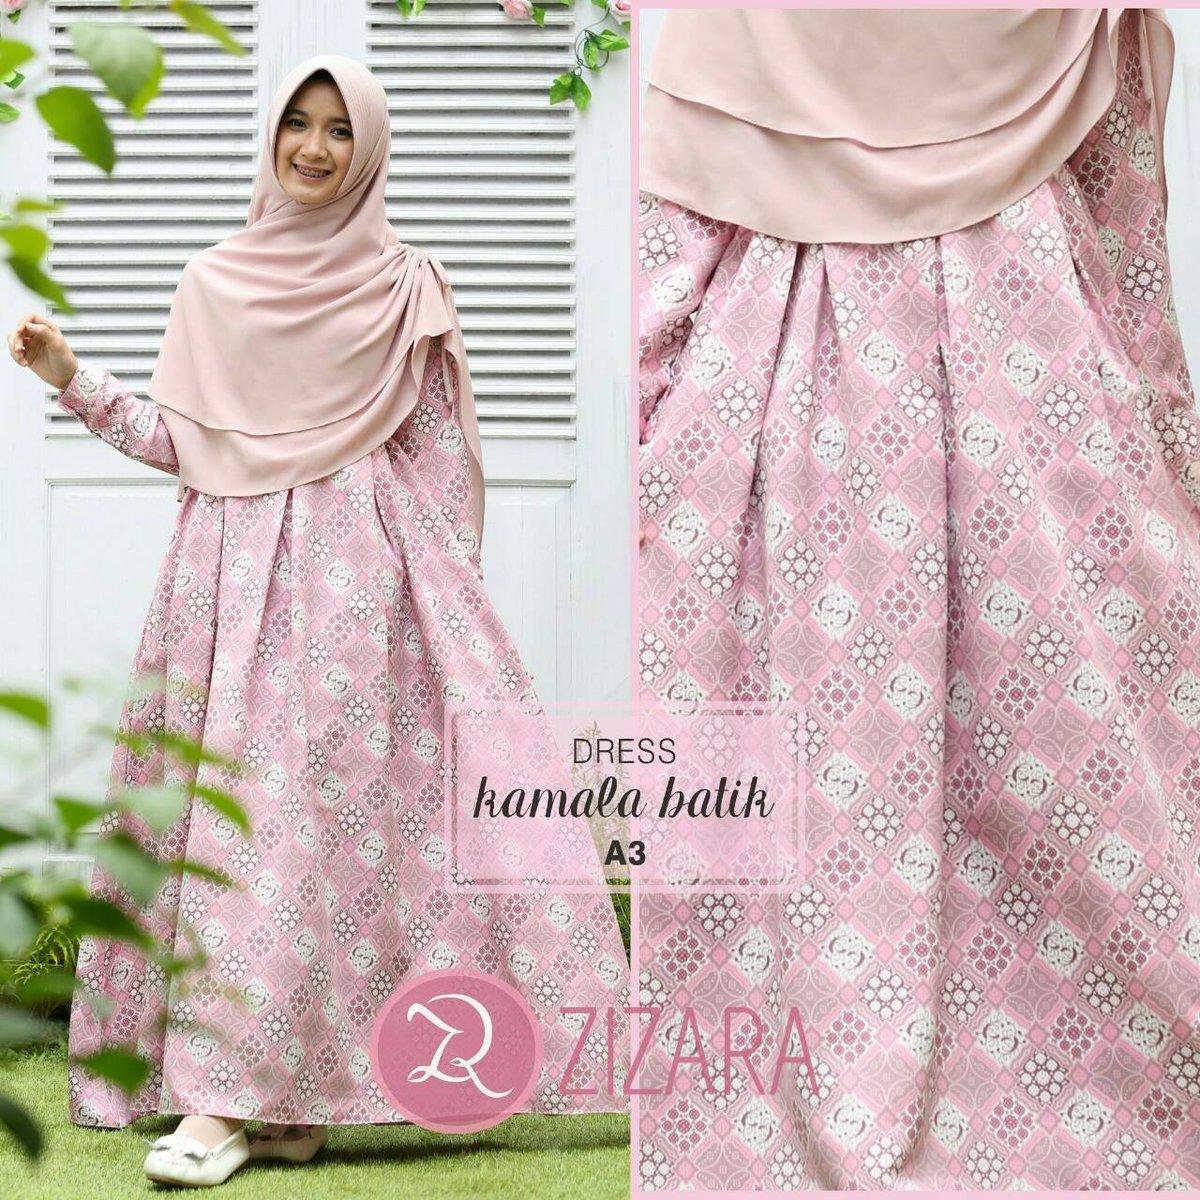 Free Ongkir Shopee On Twitter Kamala Motif Dress By Zizara